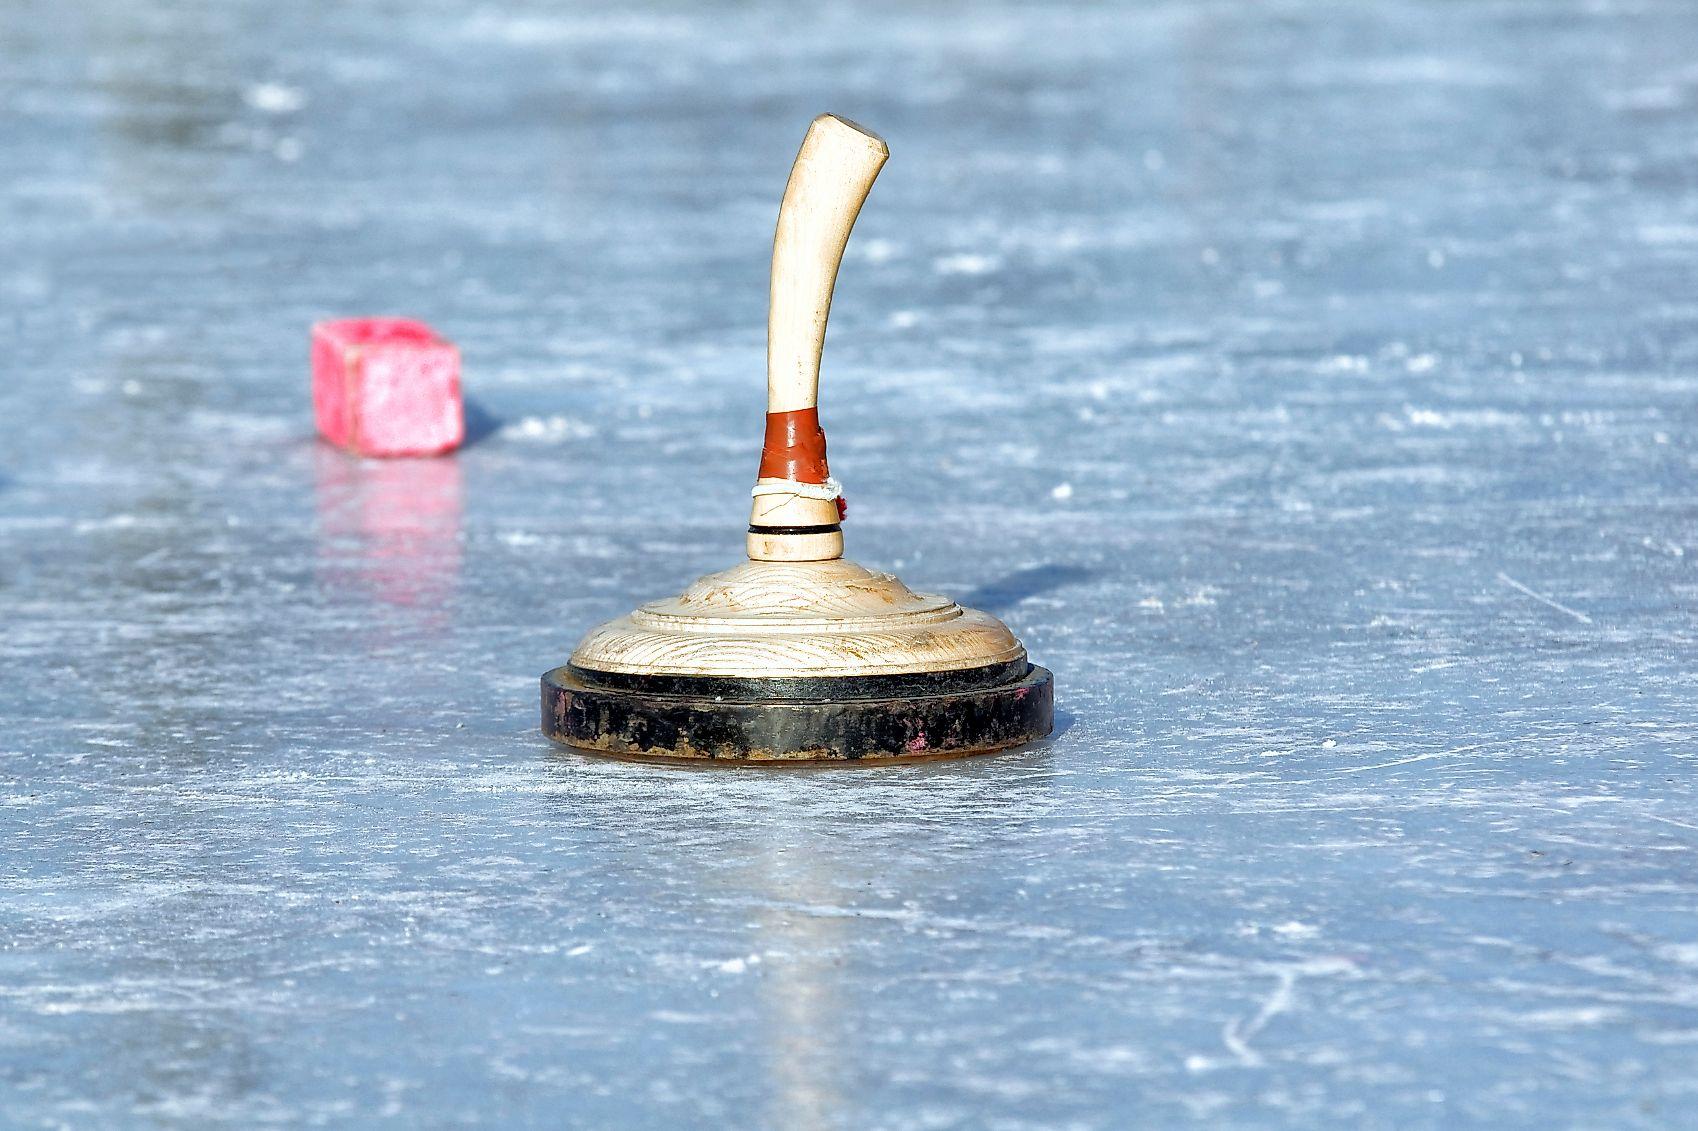 <p>Bavarian curling, a traditional, fun winter sport</p>